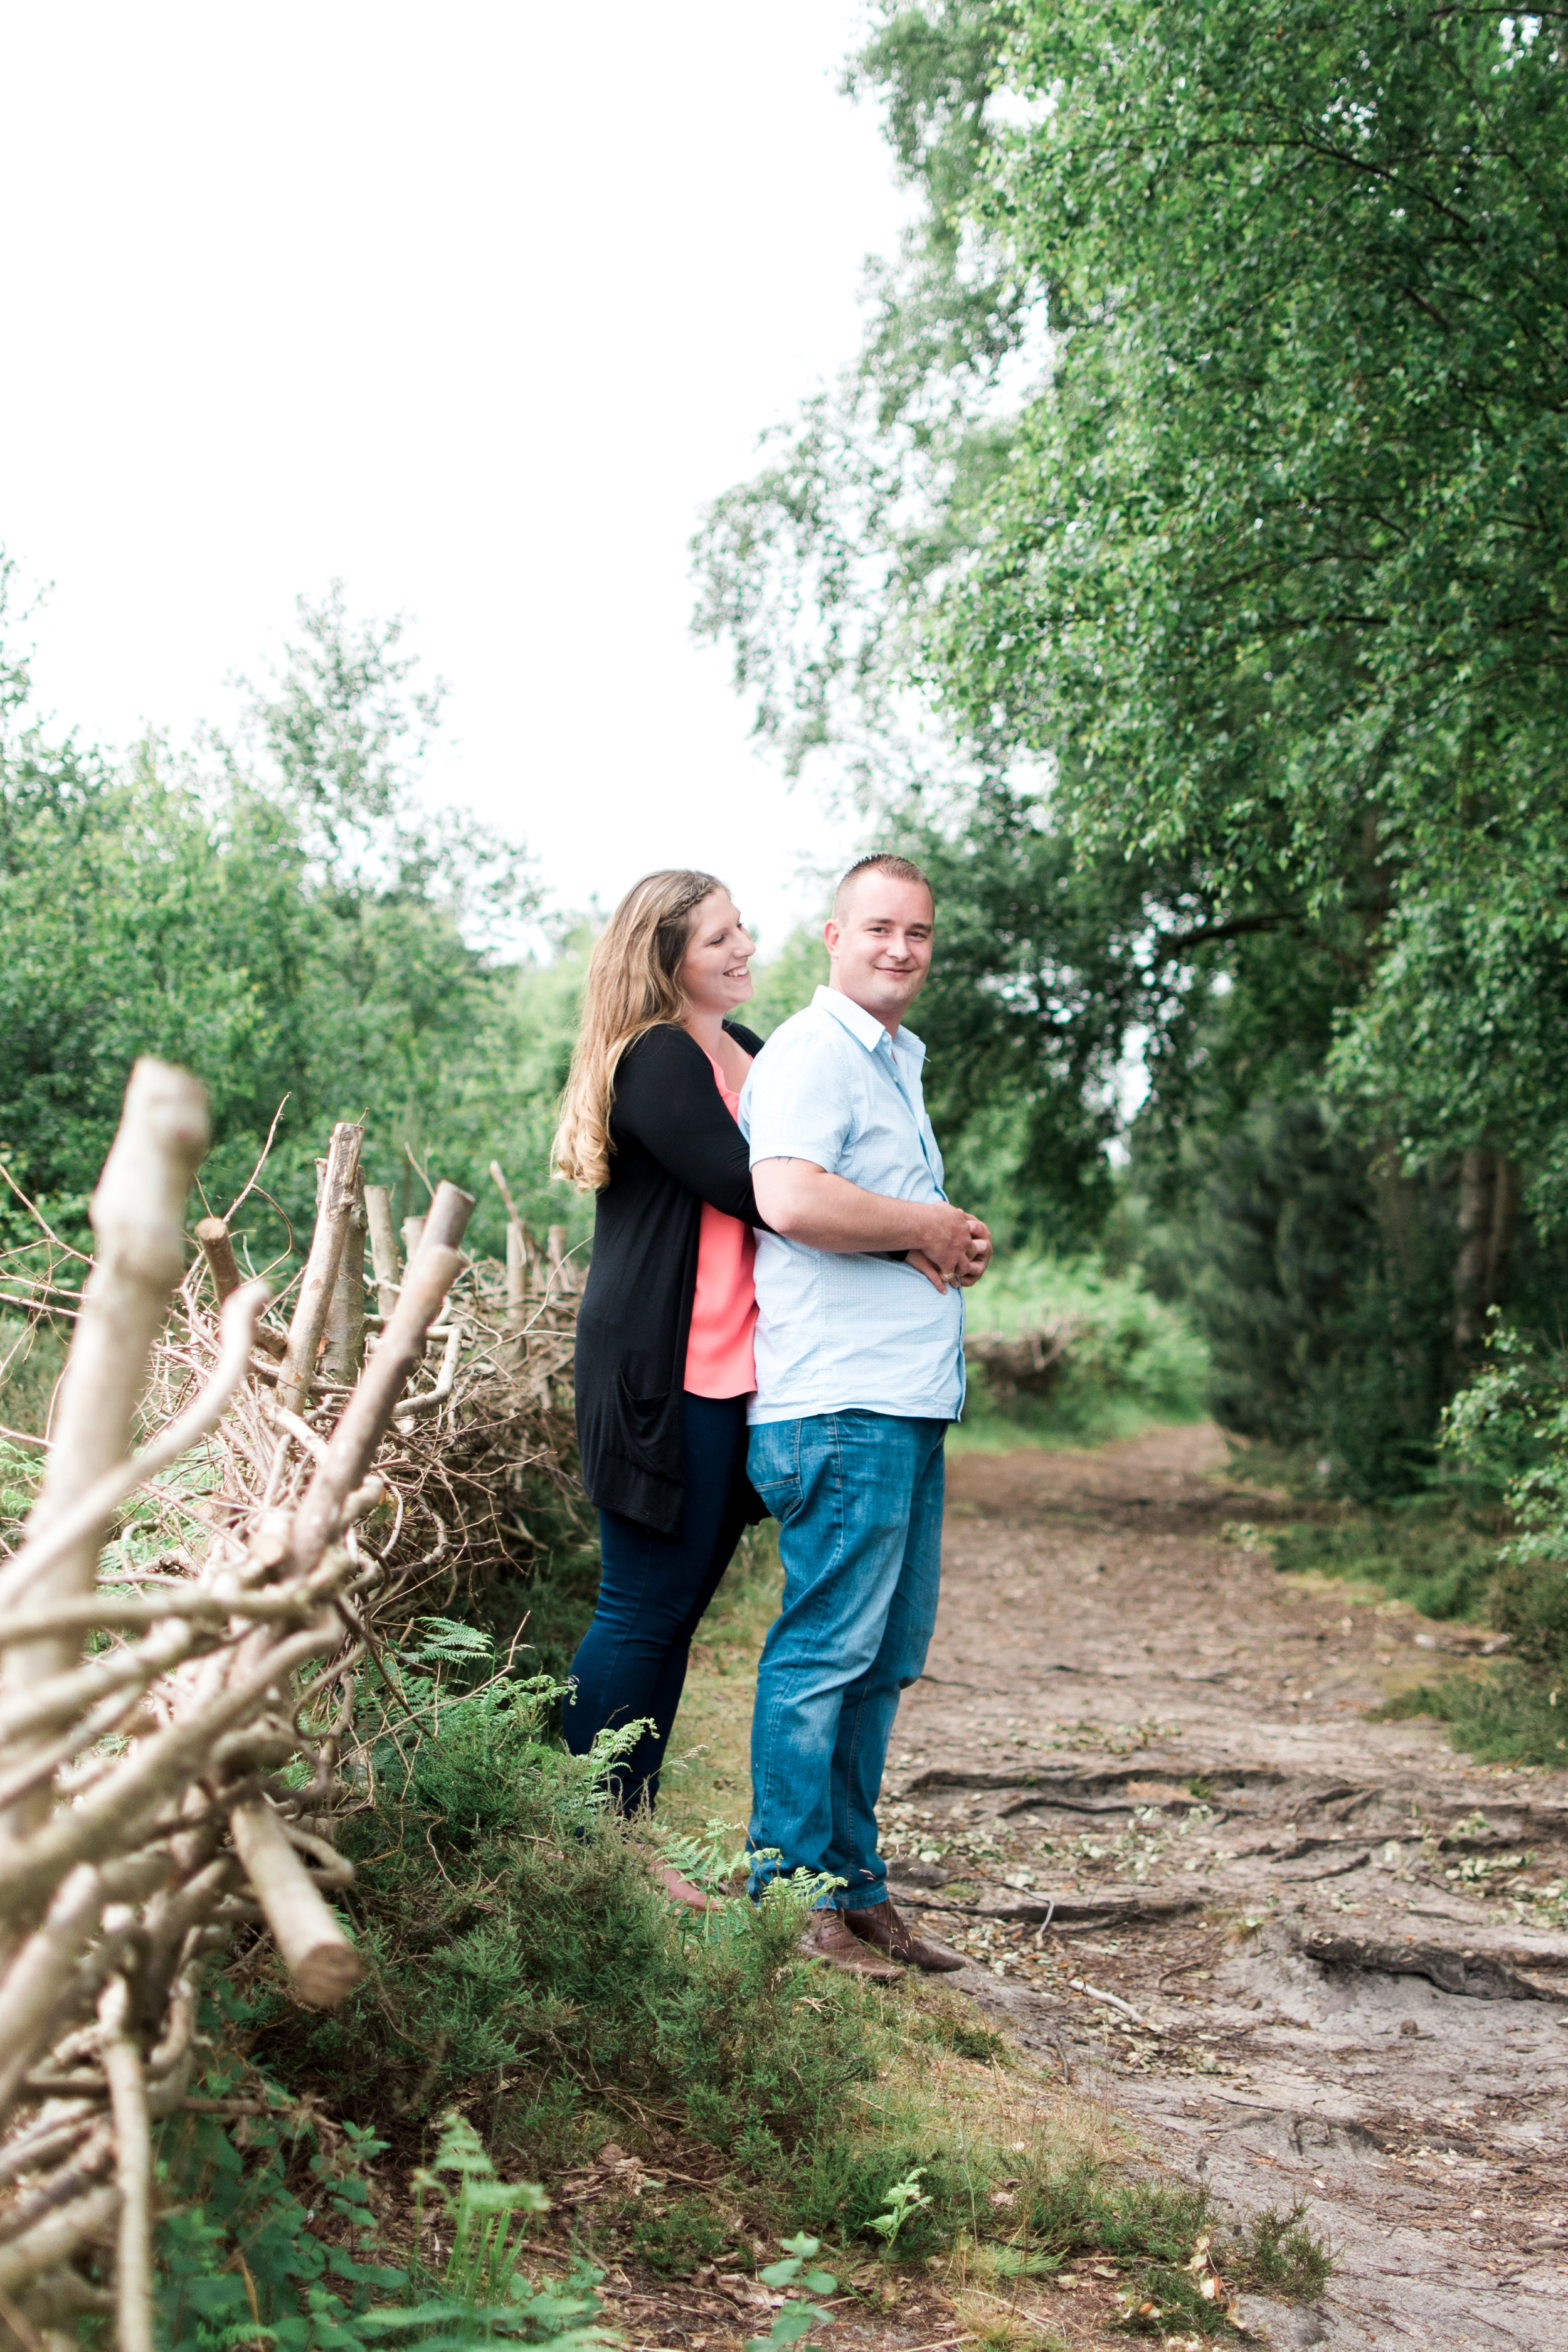 Claire & Stuart (61 of 91).jpg